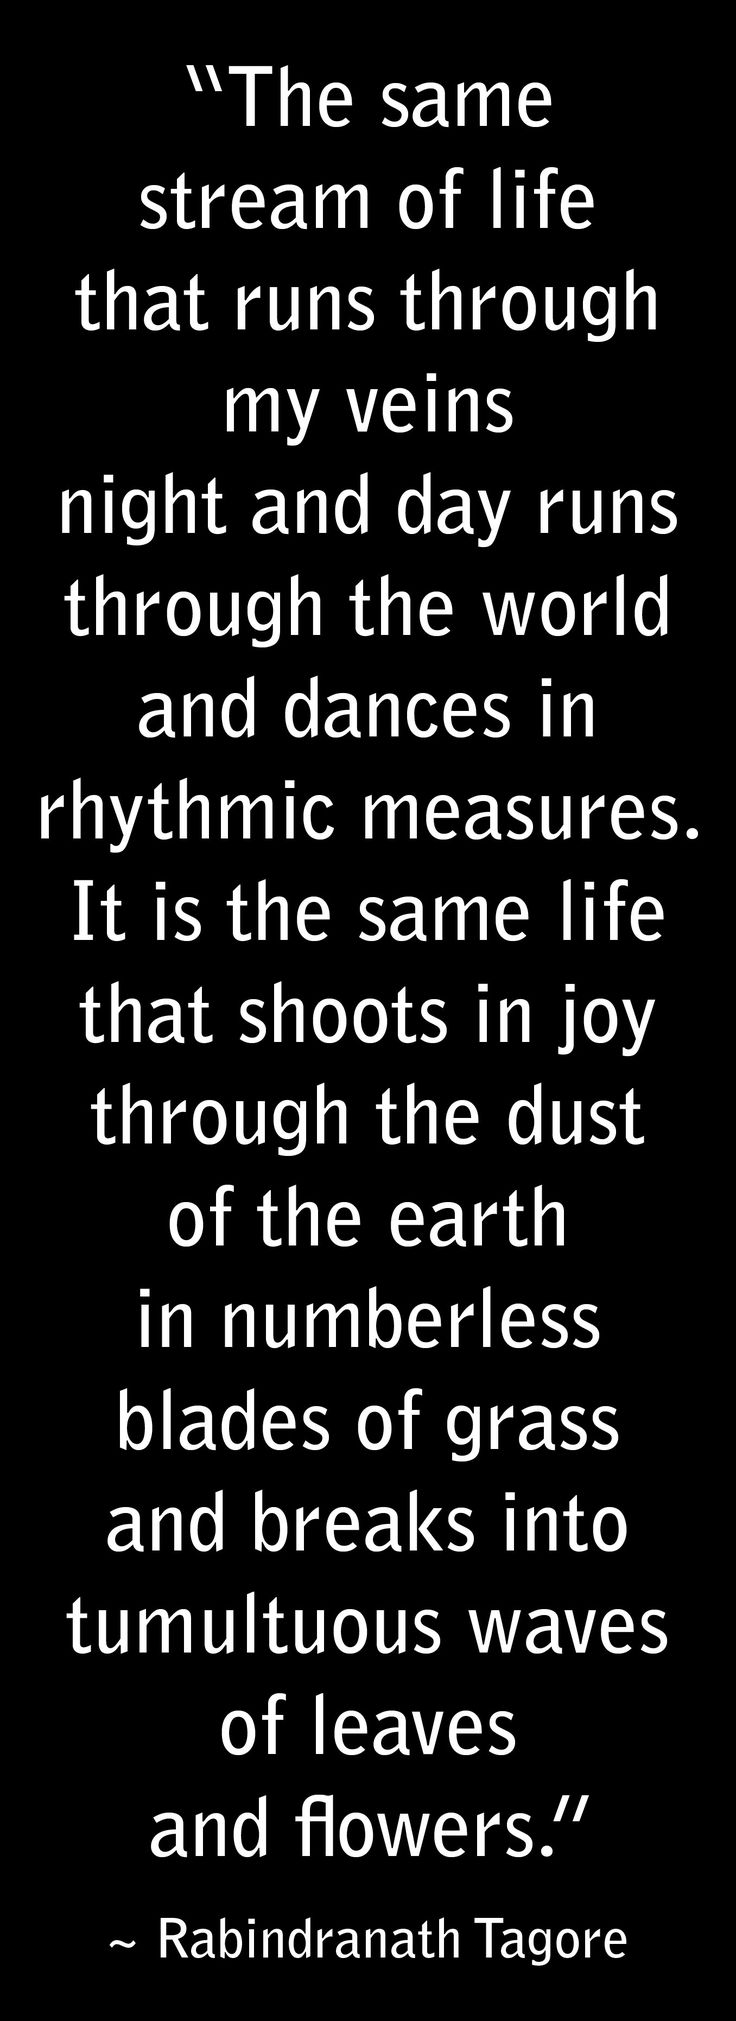 Rabindranath Tagore. Stream of Life.